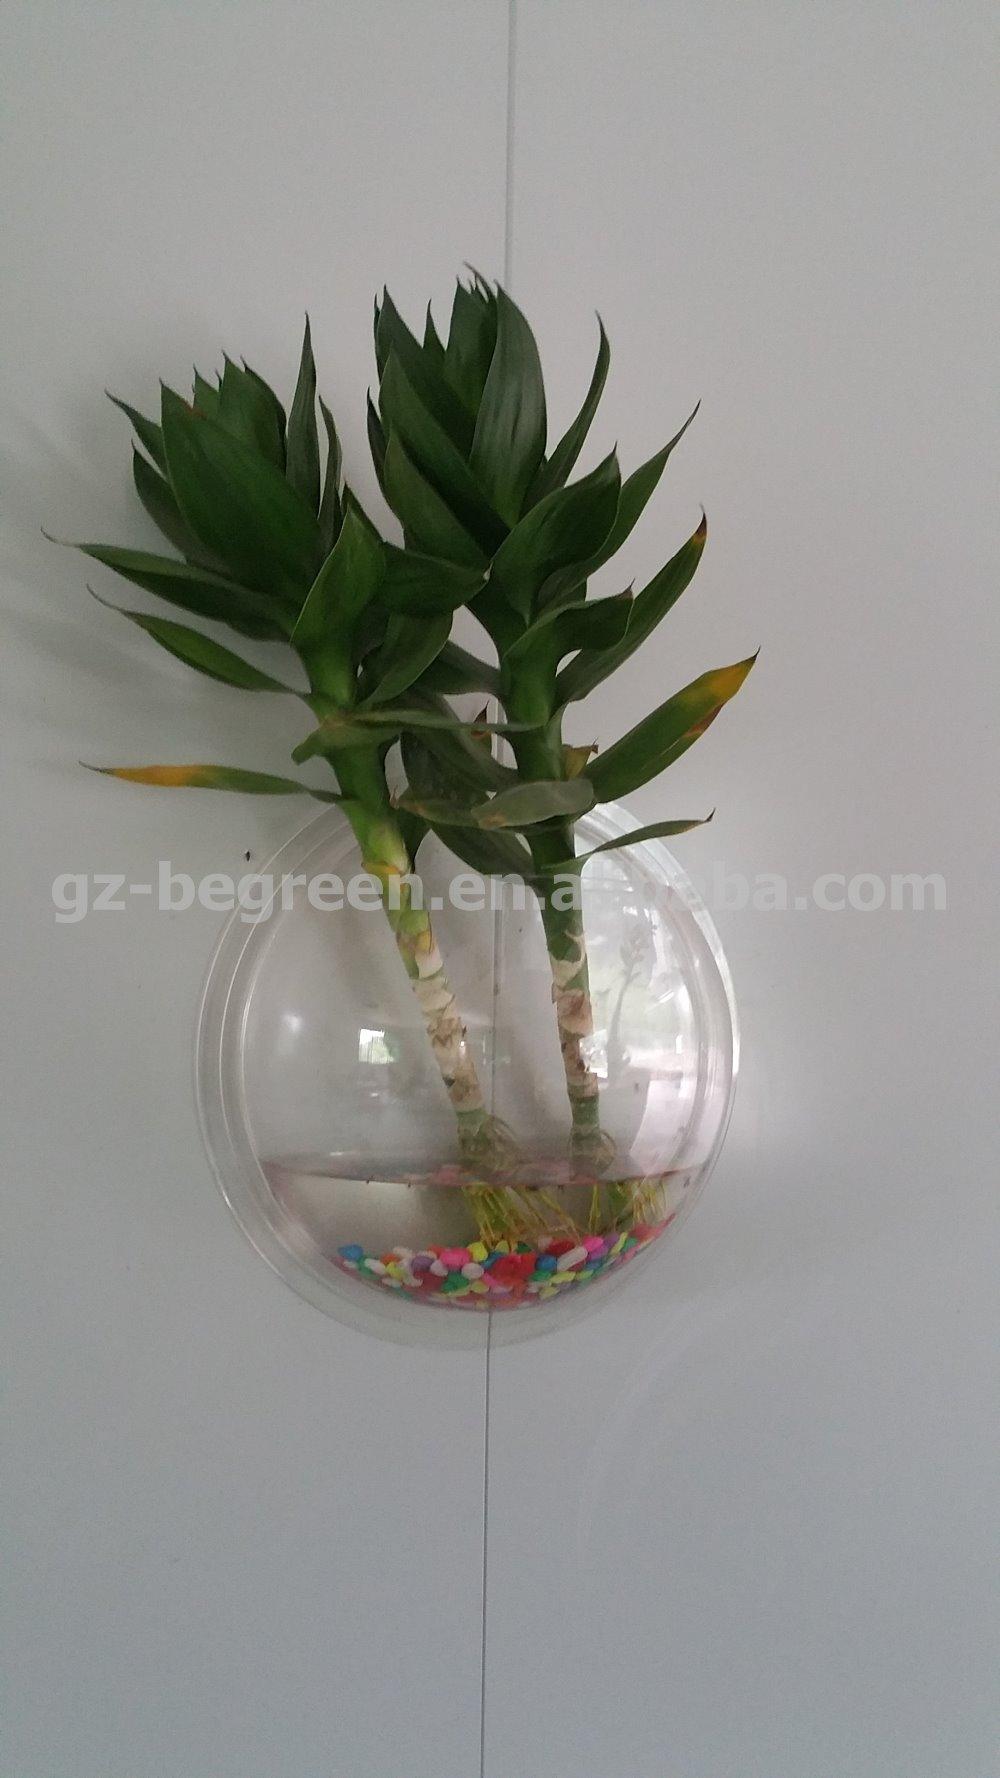 Freesky new unique plastic decoretive fish bowls buy for Cool fish bowls